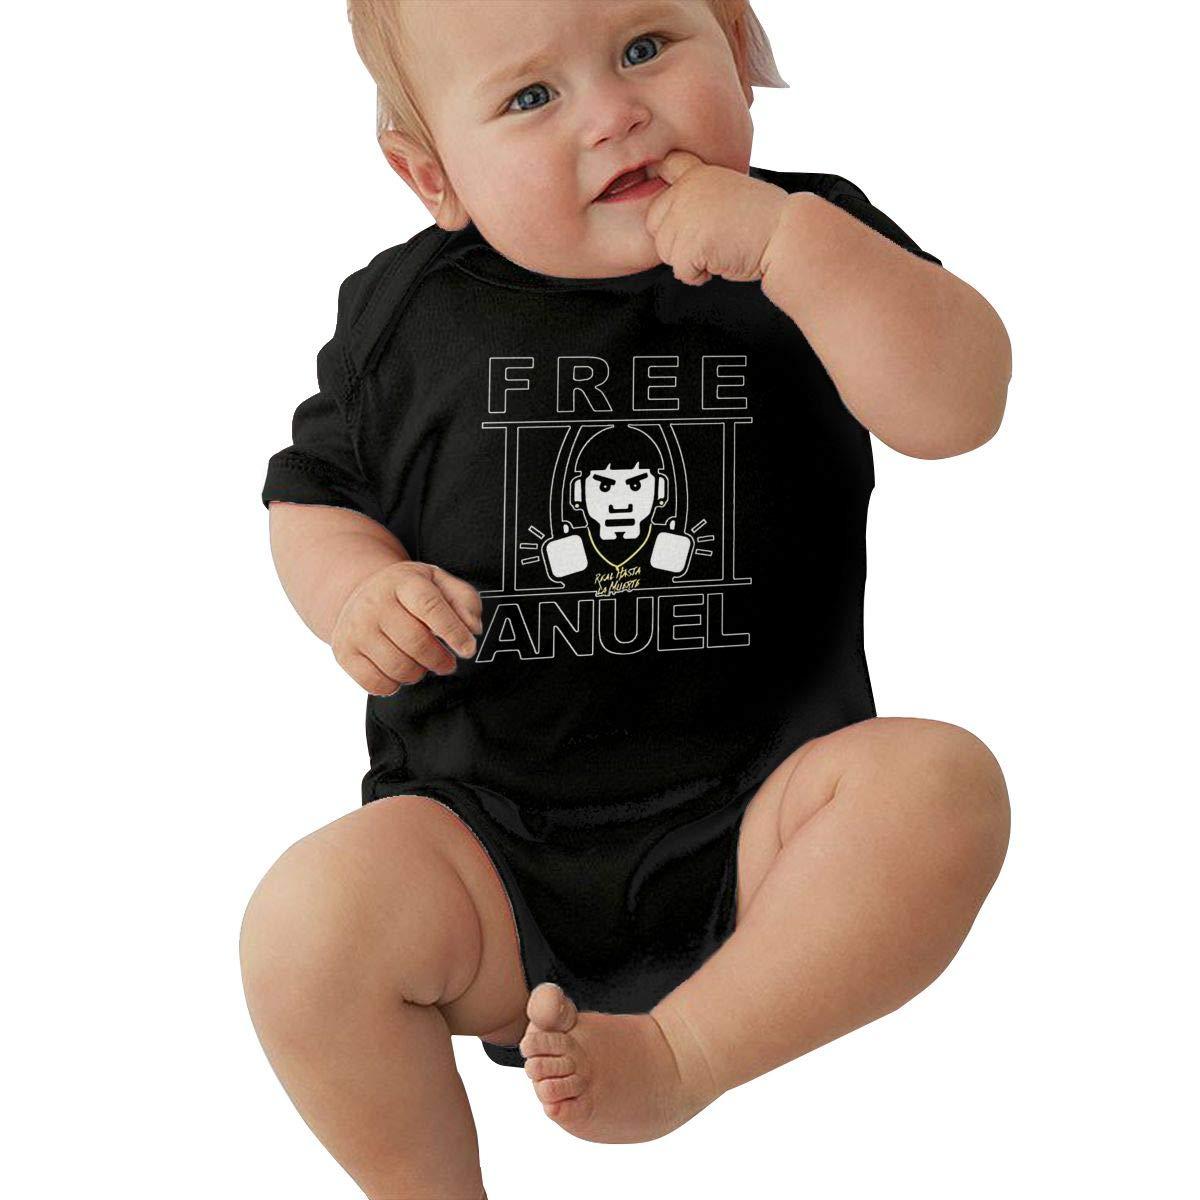 SusanHuling Anuel AA Unisex Baby Boys Girls Romper Bodysuit Infant Funny Jumpsuit